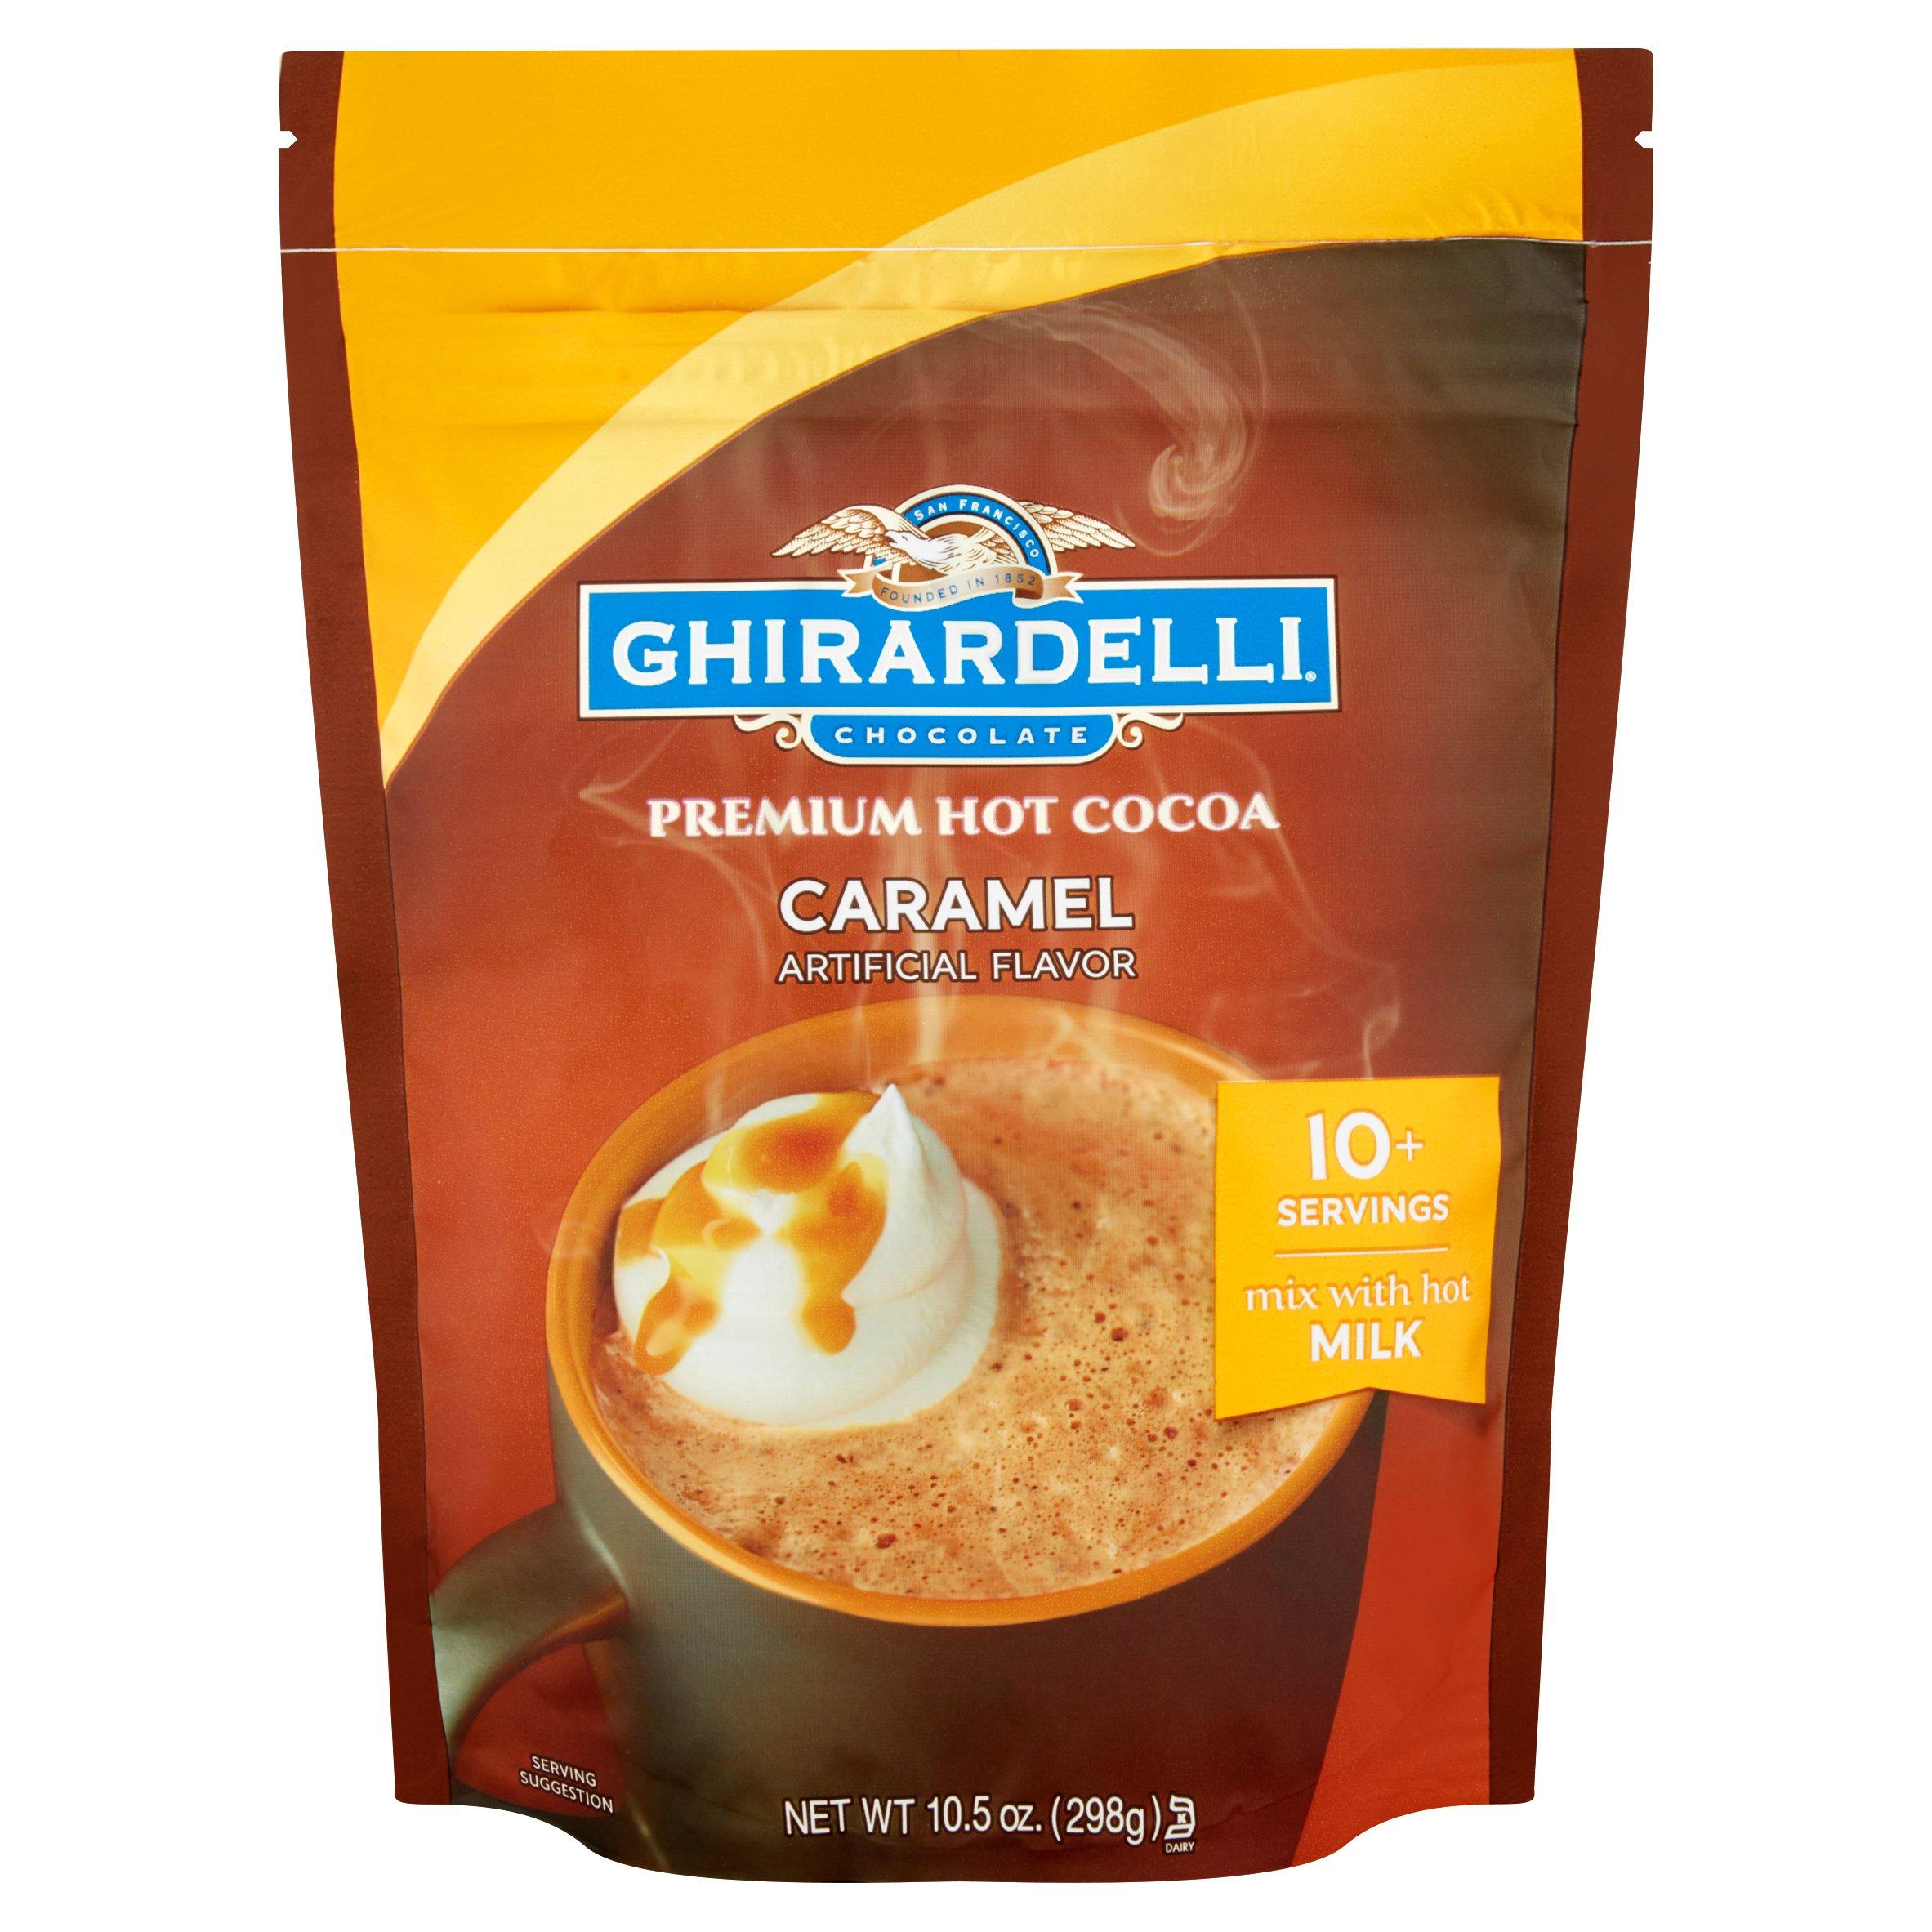 Ghirardelli Chocolate Premium Hot Cocoa Caramel, 10.5 OZ by Ghirardelli Chocolate Company